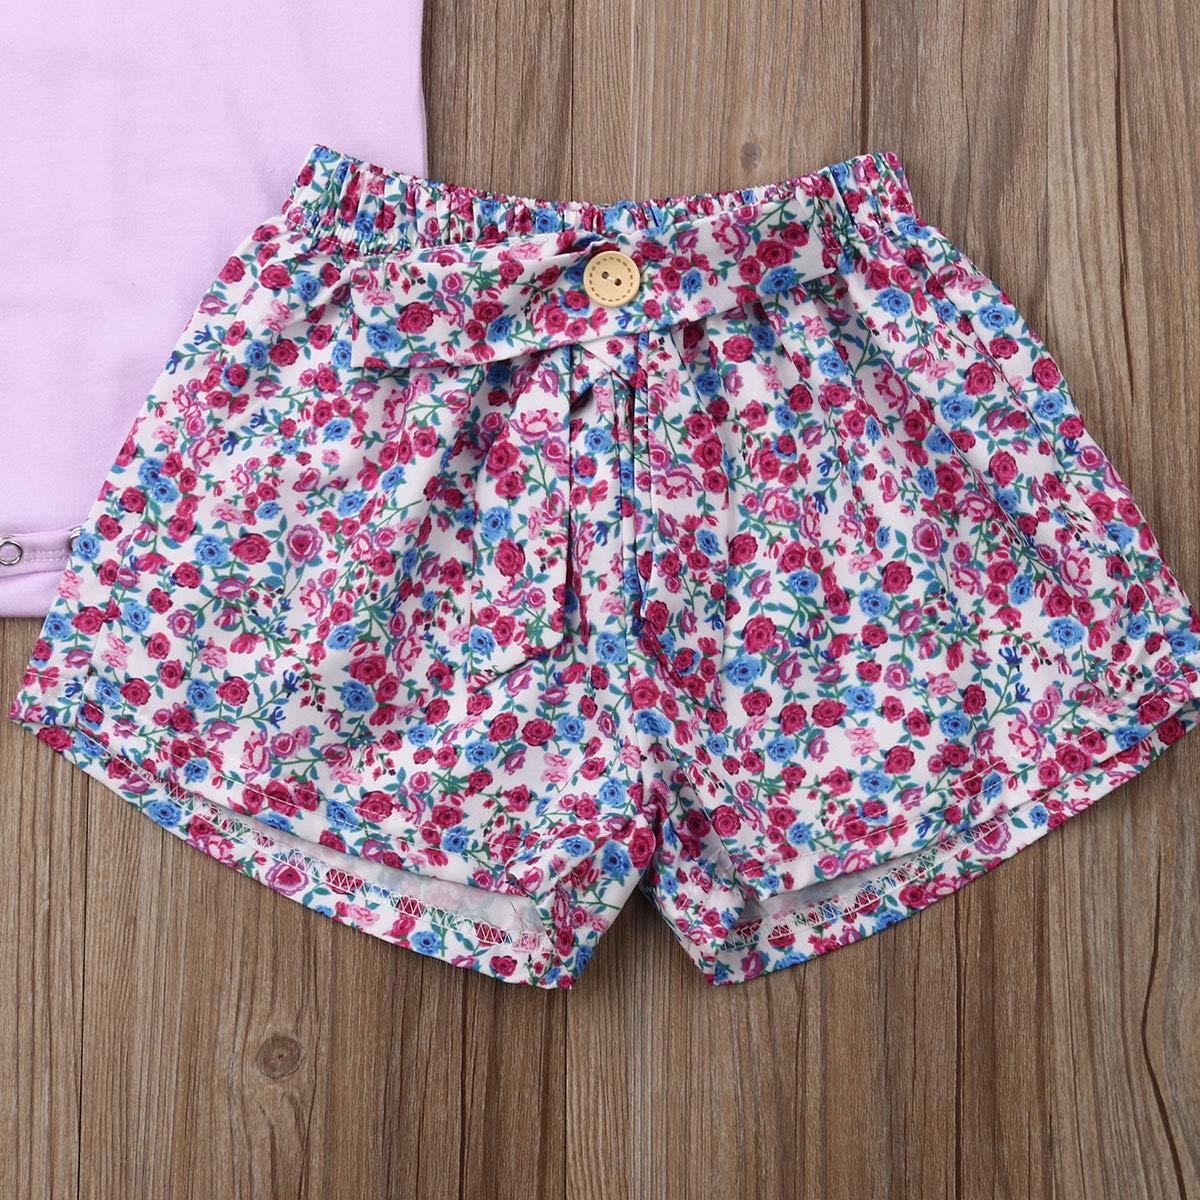 Headband 3PCS Outfit Set Shorts Pants Newborn Baby Girl Romper Jumpsuit Bodysuit